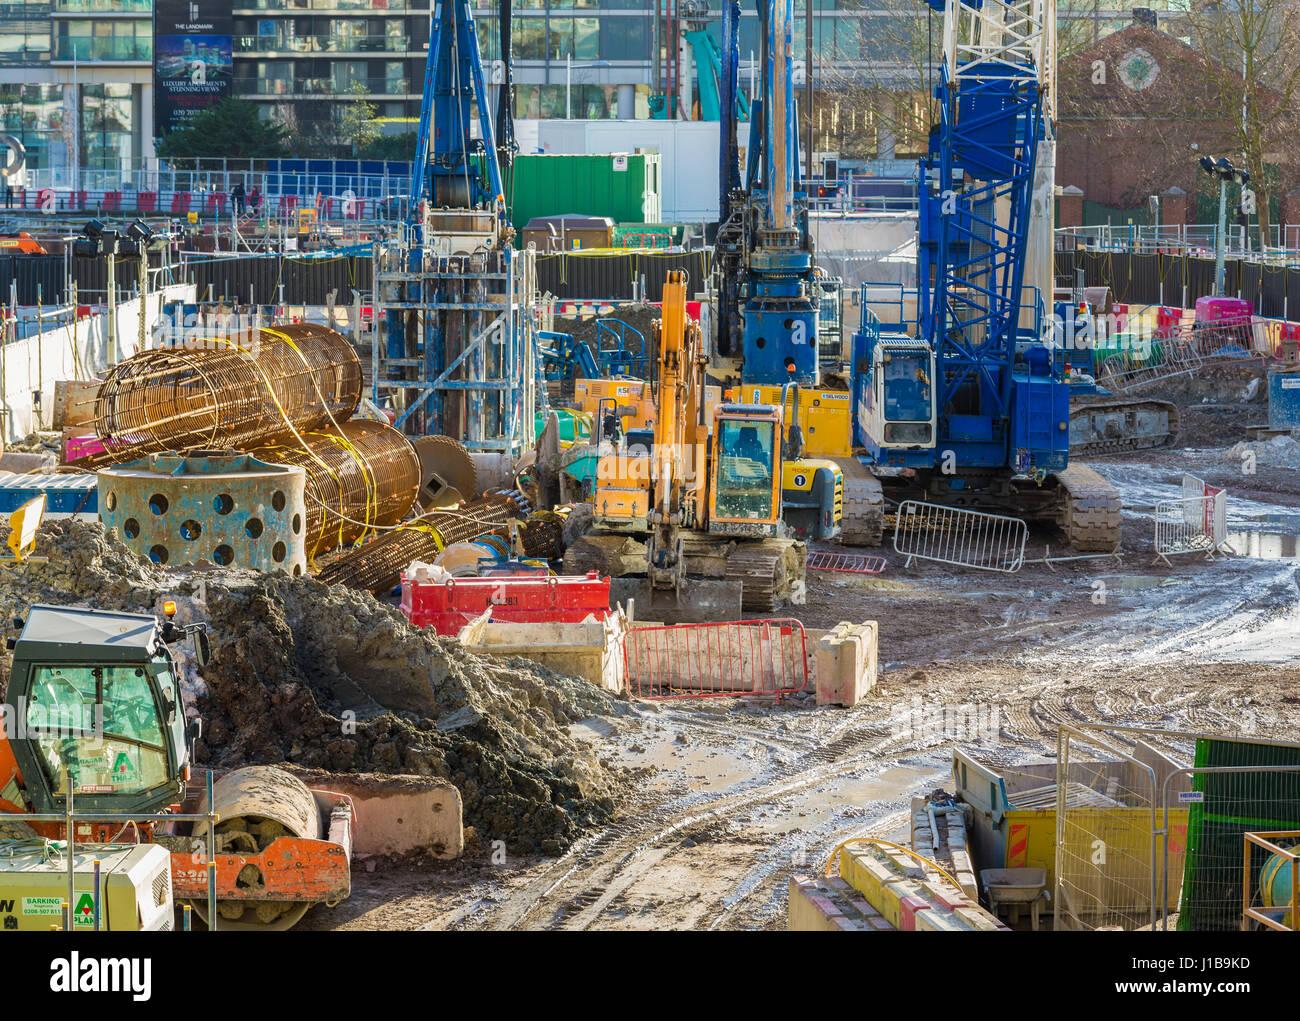 Building site - construction site - Docklands, London, England - Stock Image